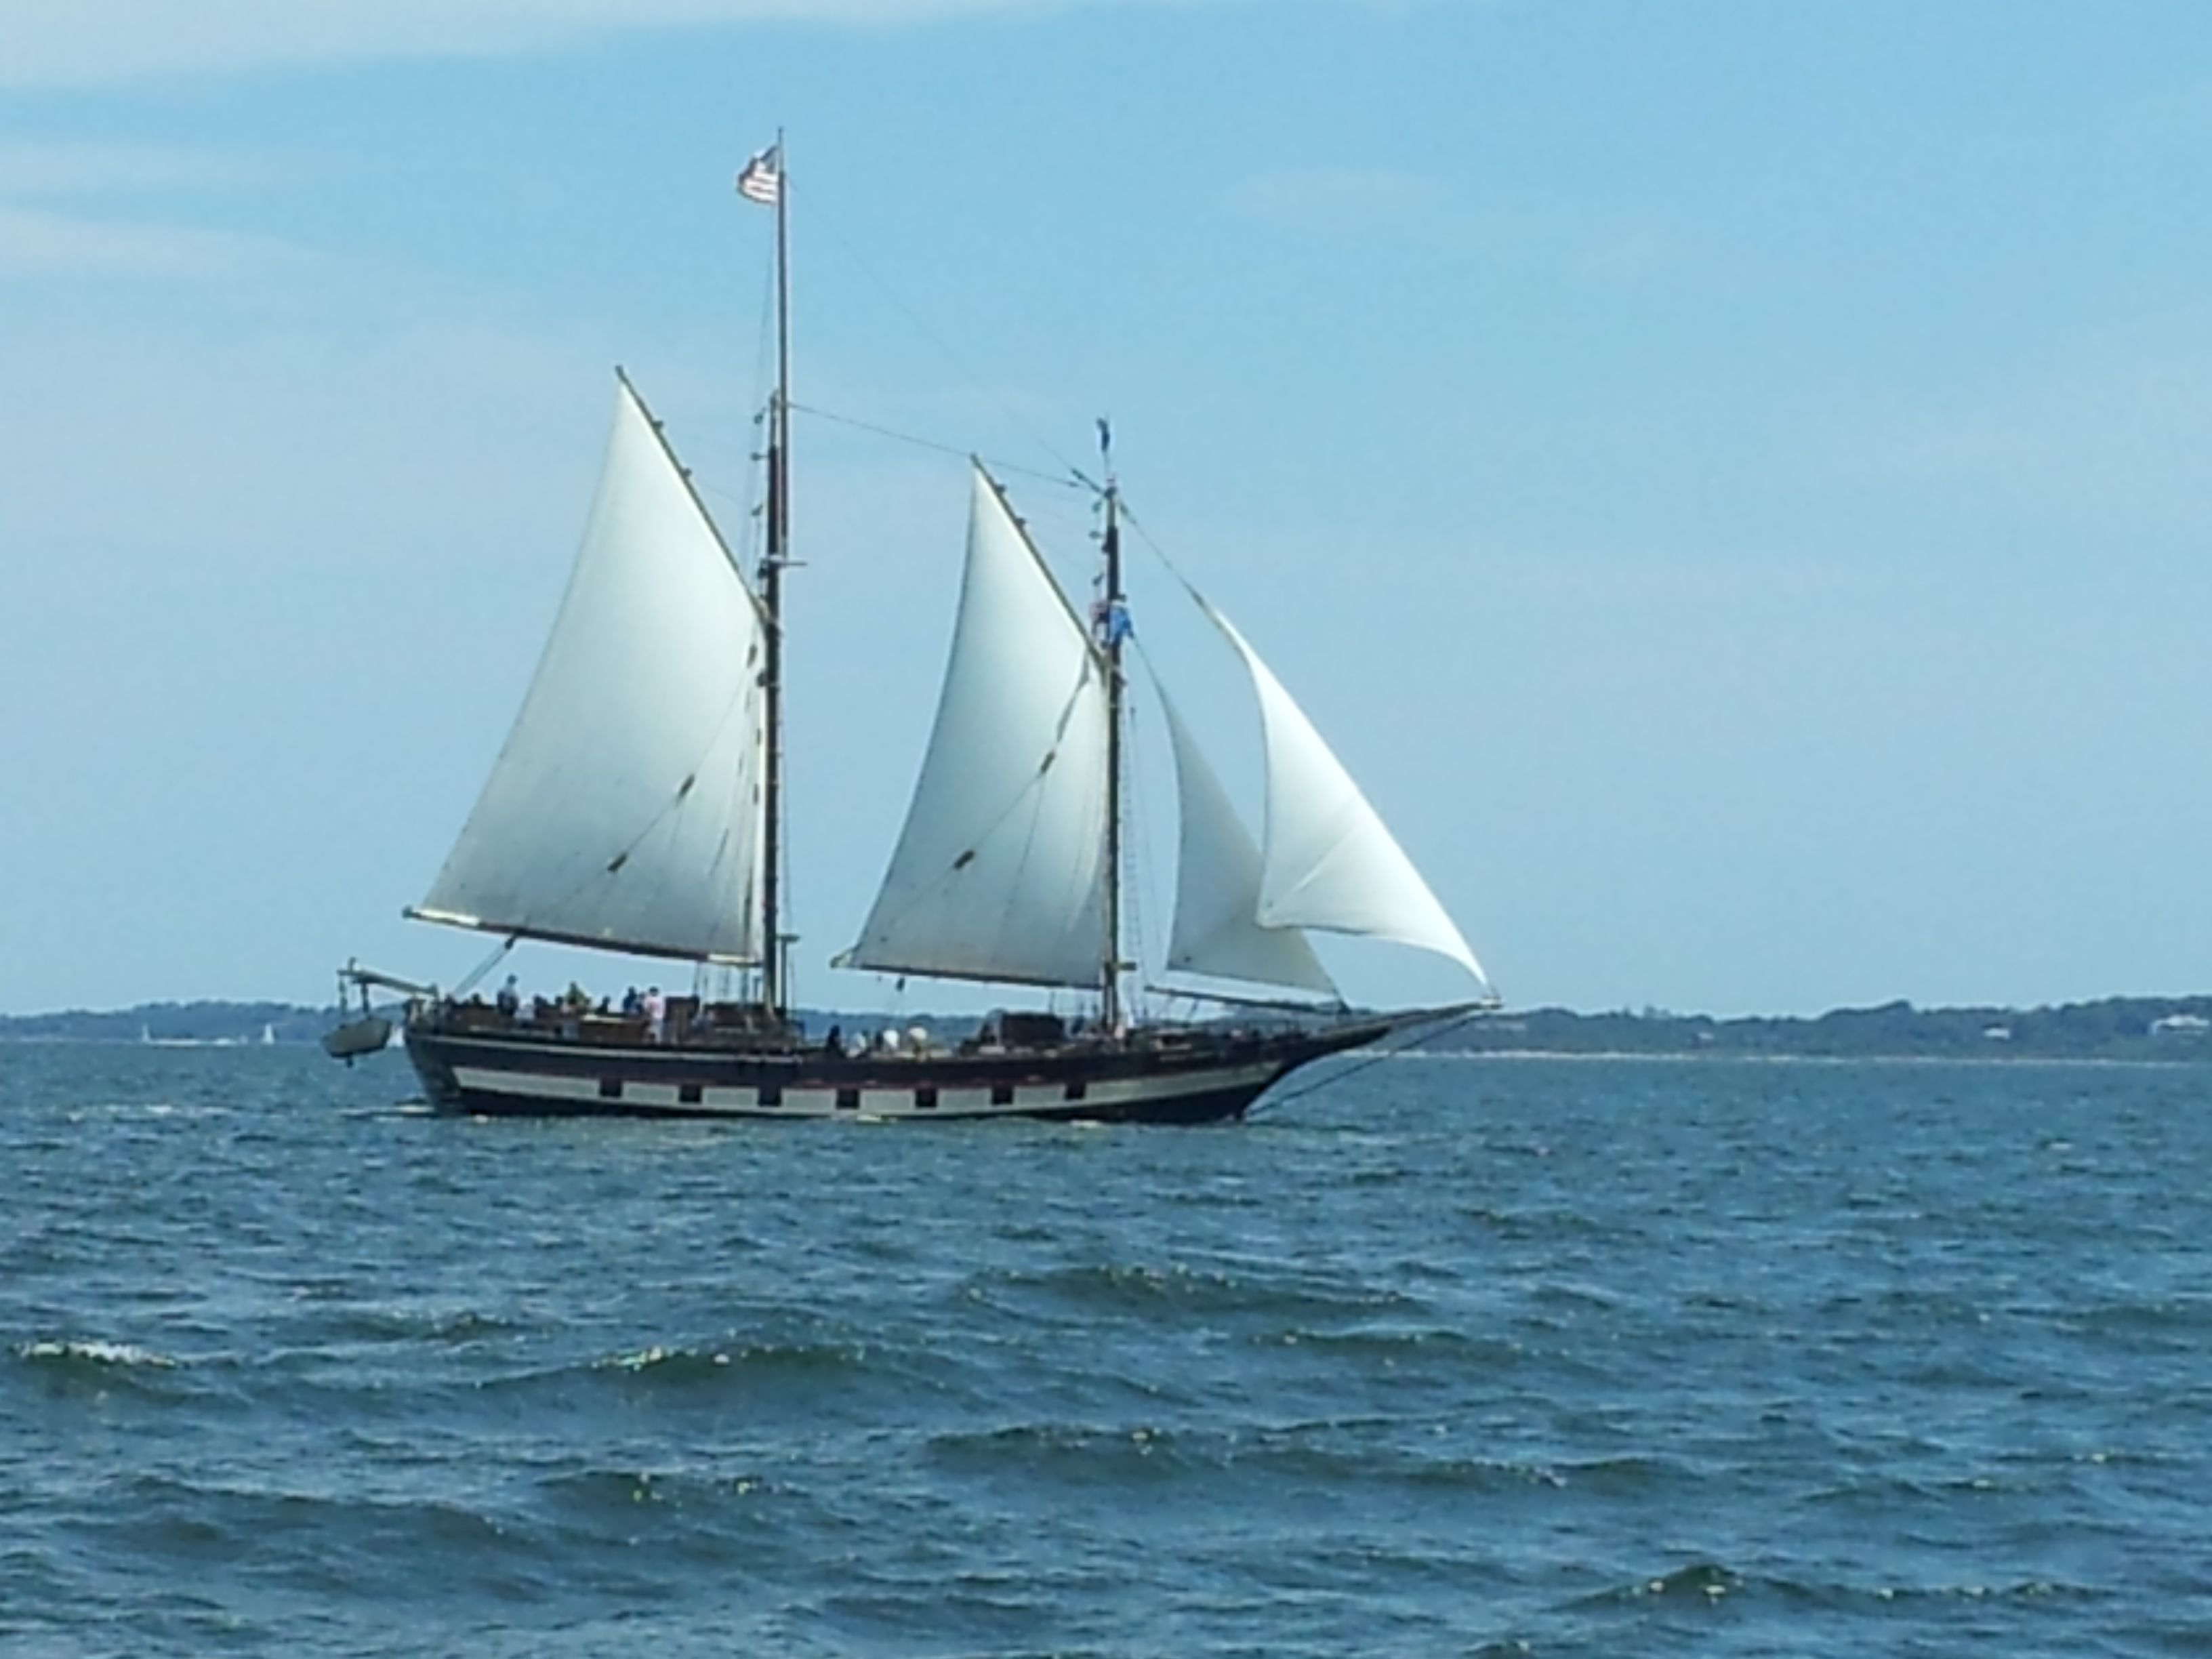 I'm sailing away.